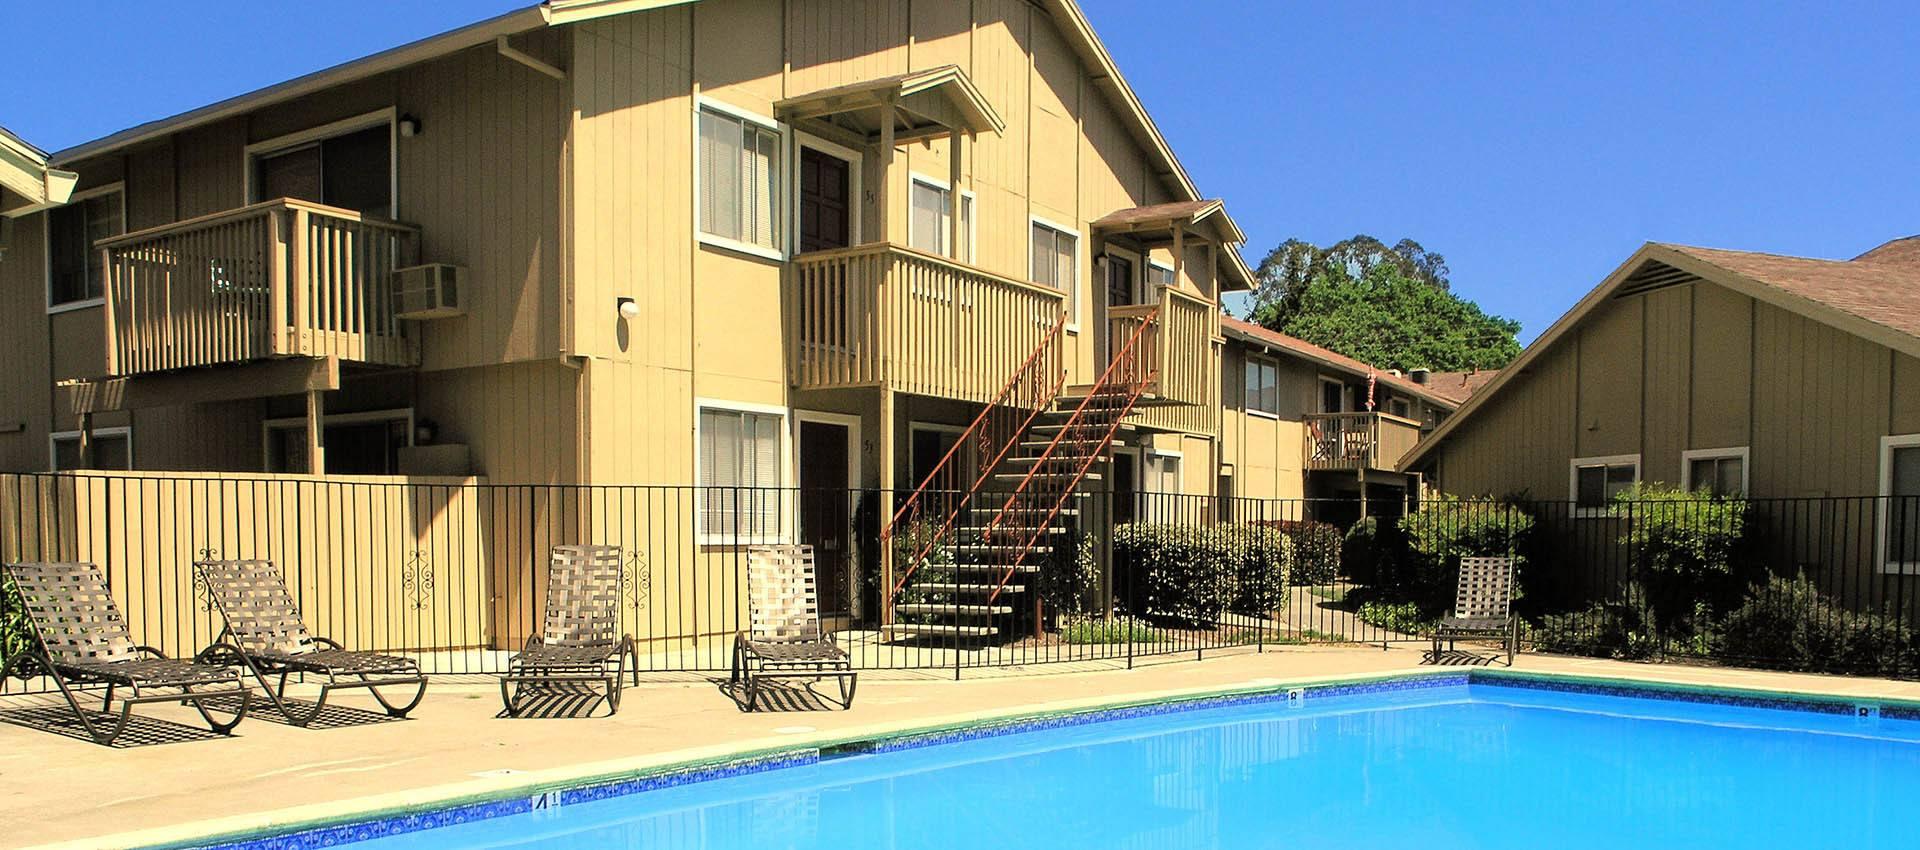 Pool at Spring Lake Apartment Homes in Santa Rosa, CA